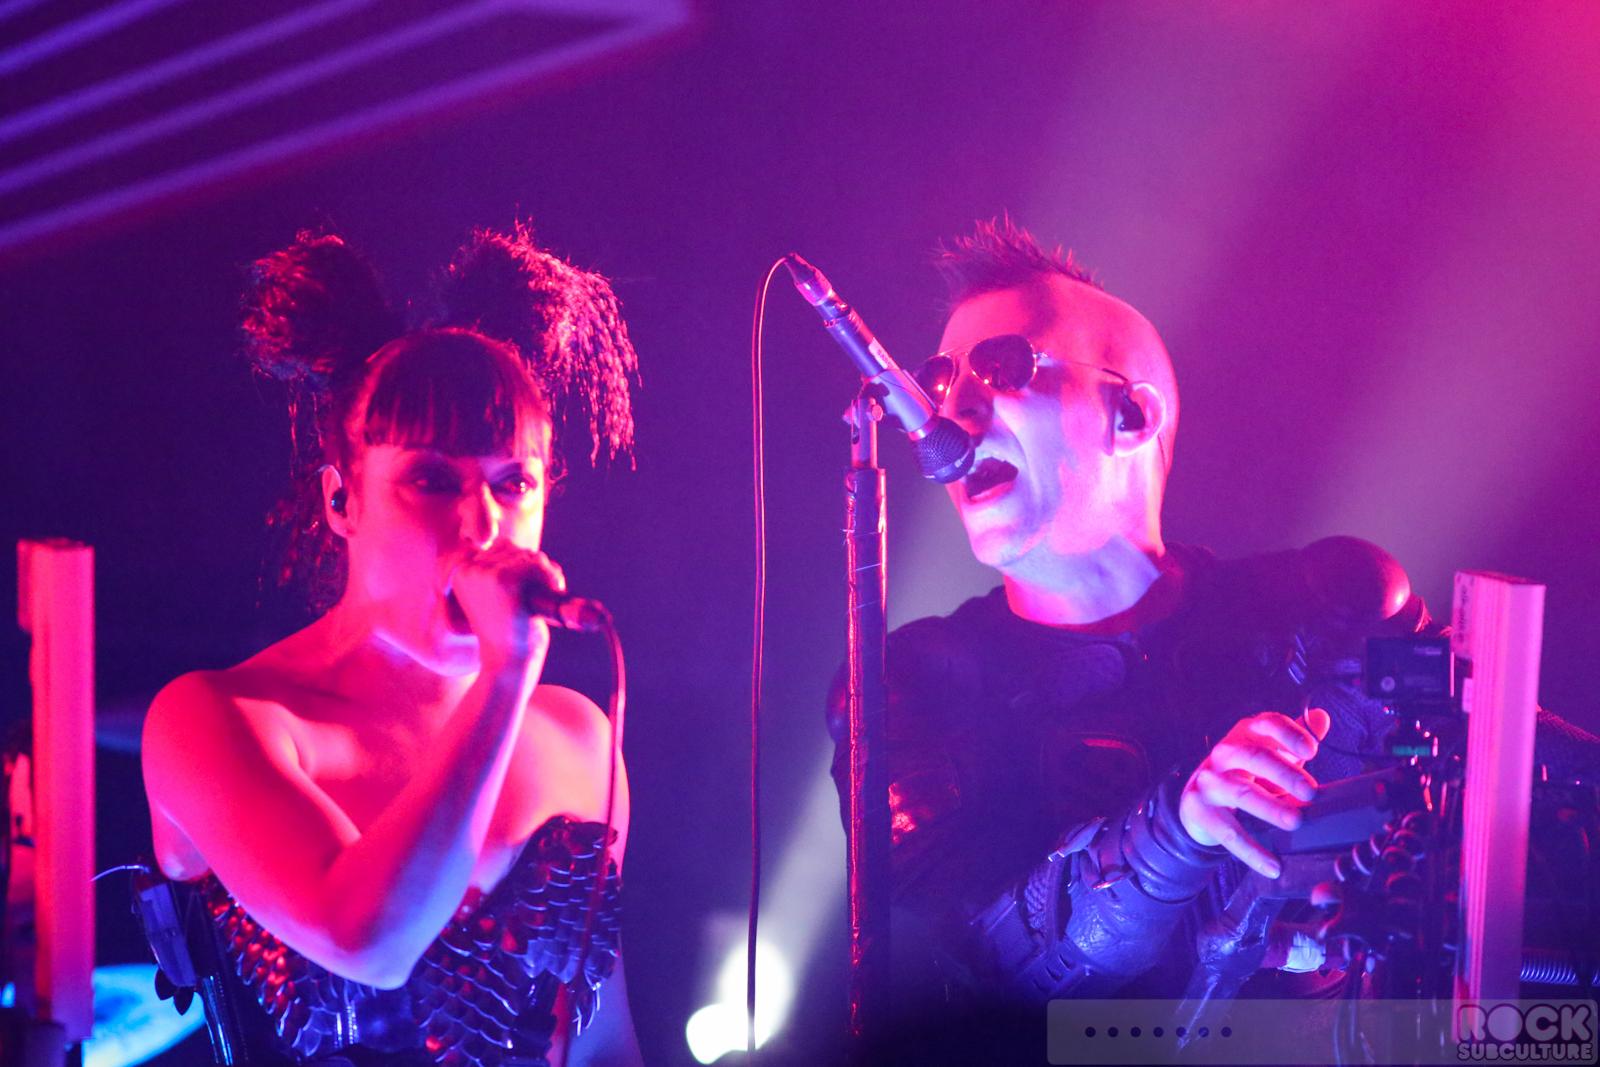 Tohuvabohu - KMFDM | User Reviews | AllMusic